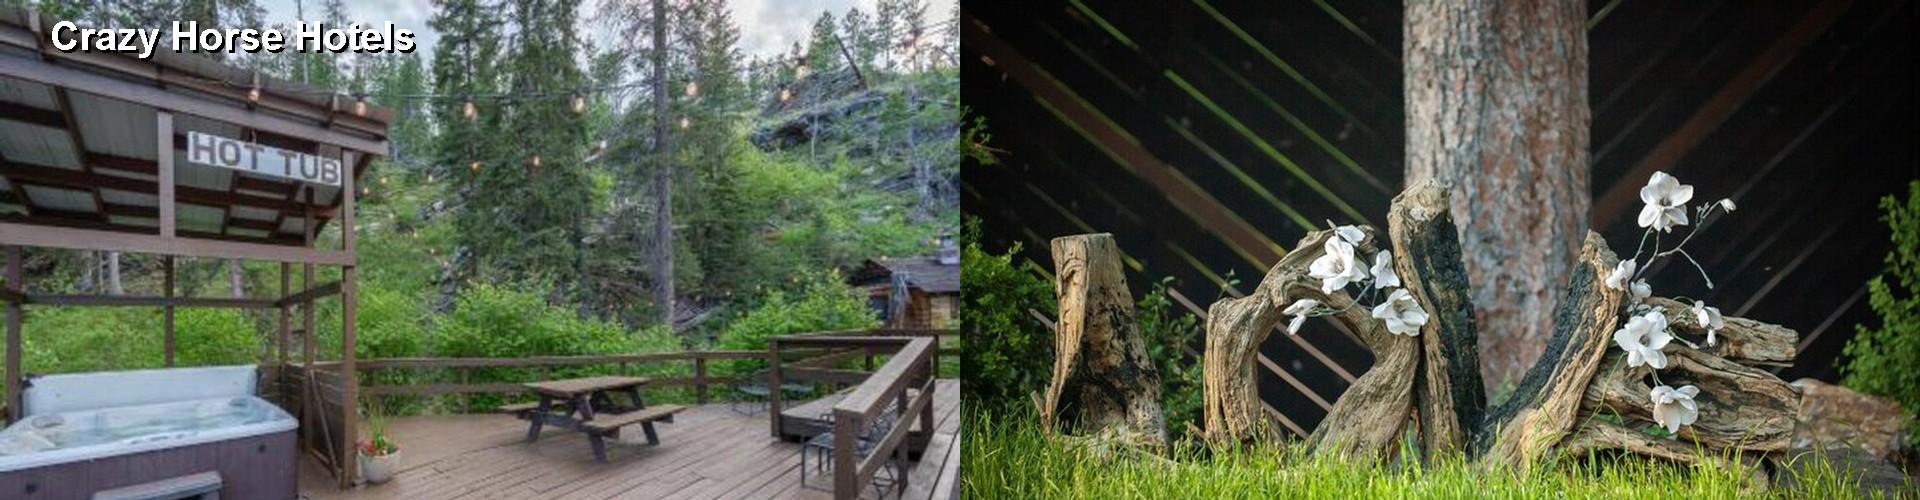 5 Best Hotels Near Crazy Horse